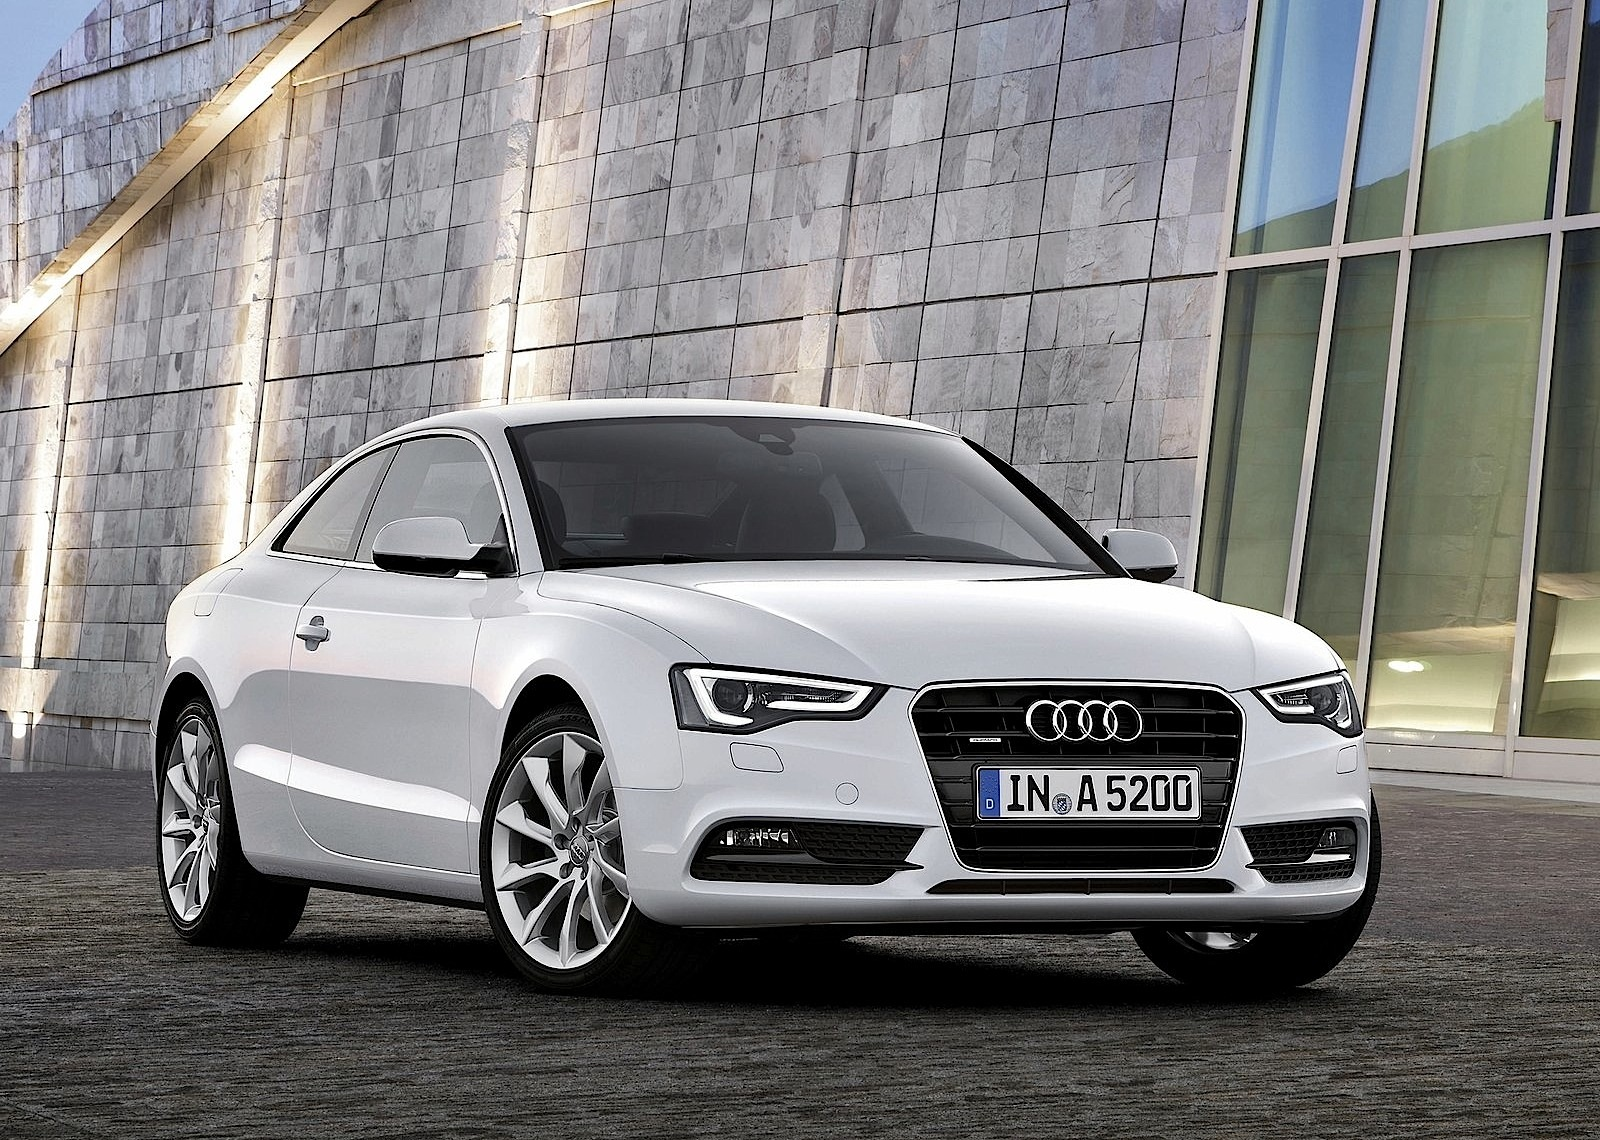 Audi A5 Specs Photos 2011 2012 2013 2014 2015 2016 Autoevolution